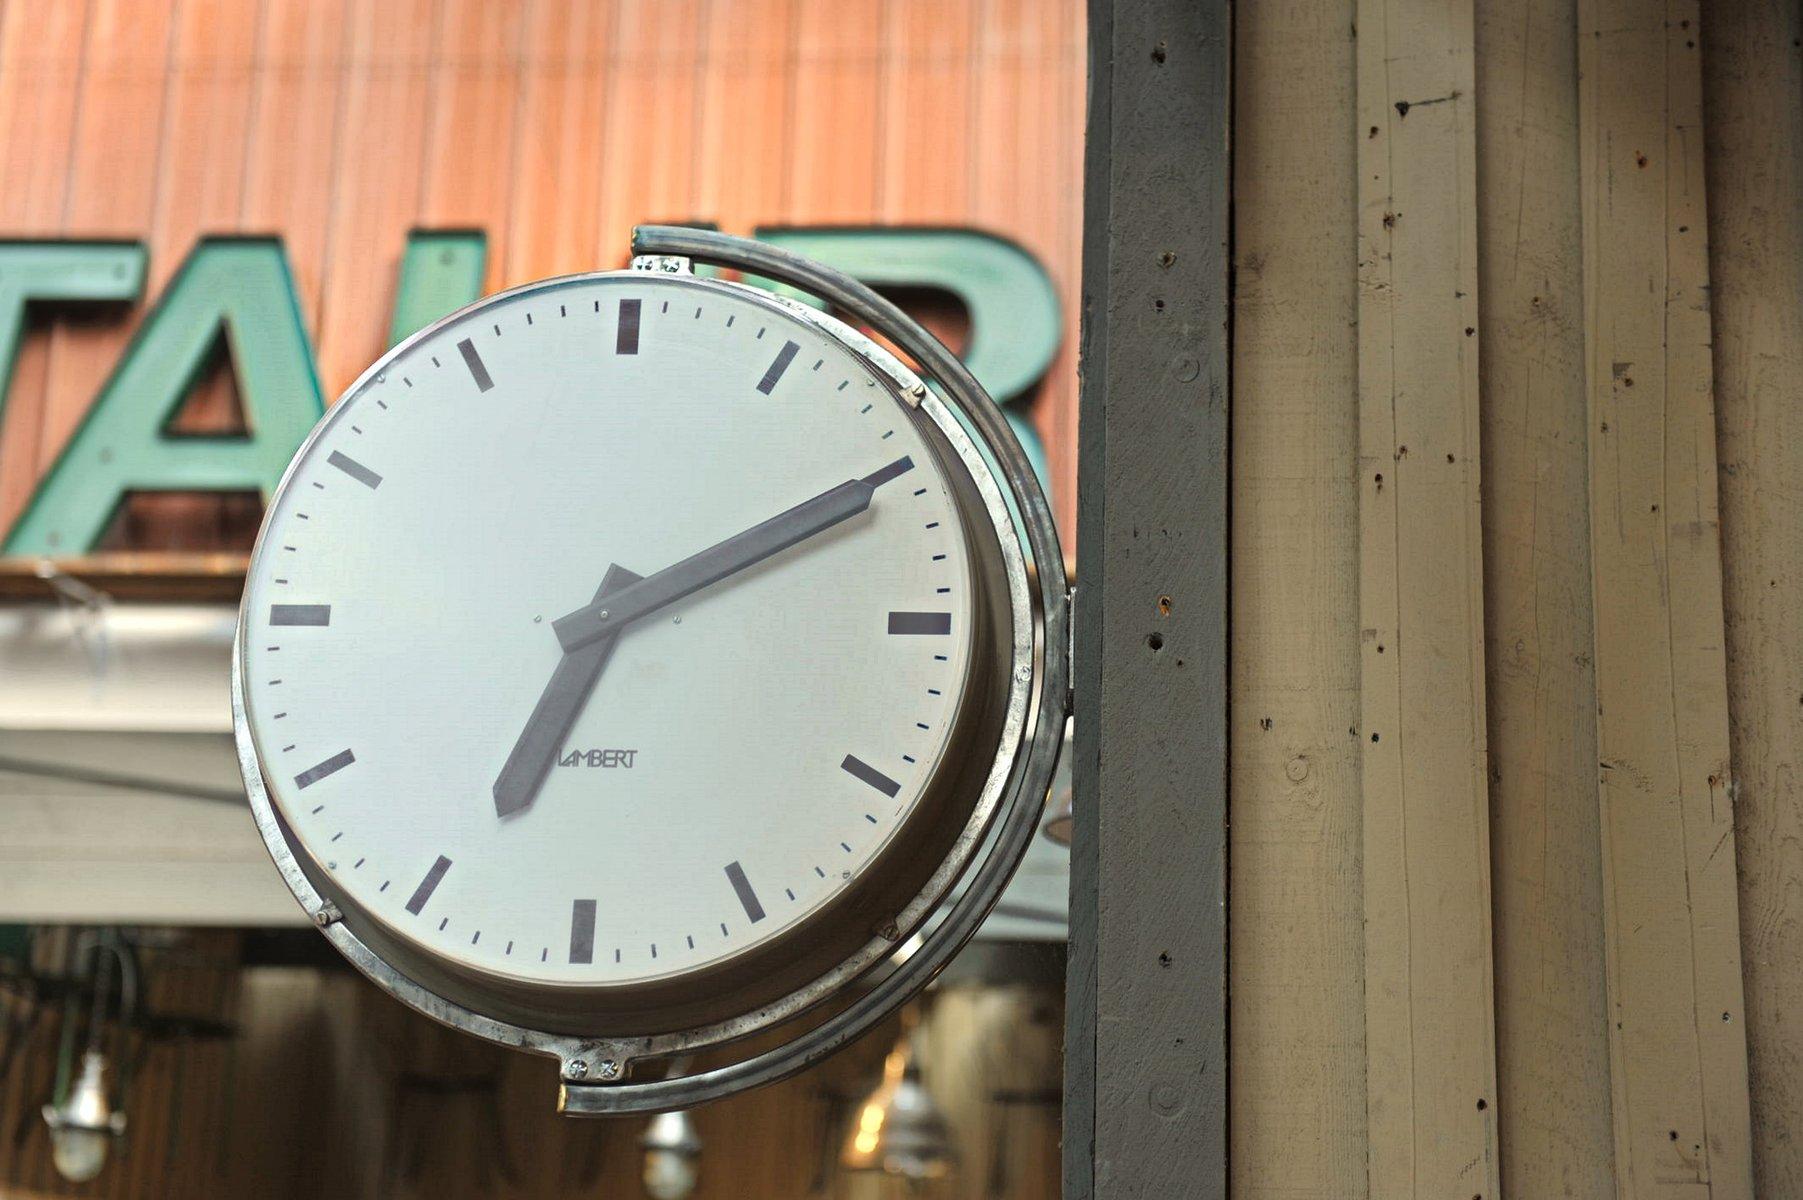 grande horloge murale d usine de lambert 1960s en vente sur pamono. Black Bedroom Furniture Sets. Home Design Ideas